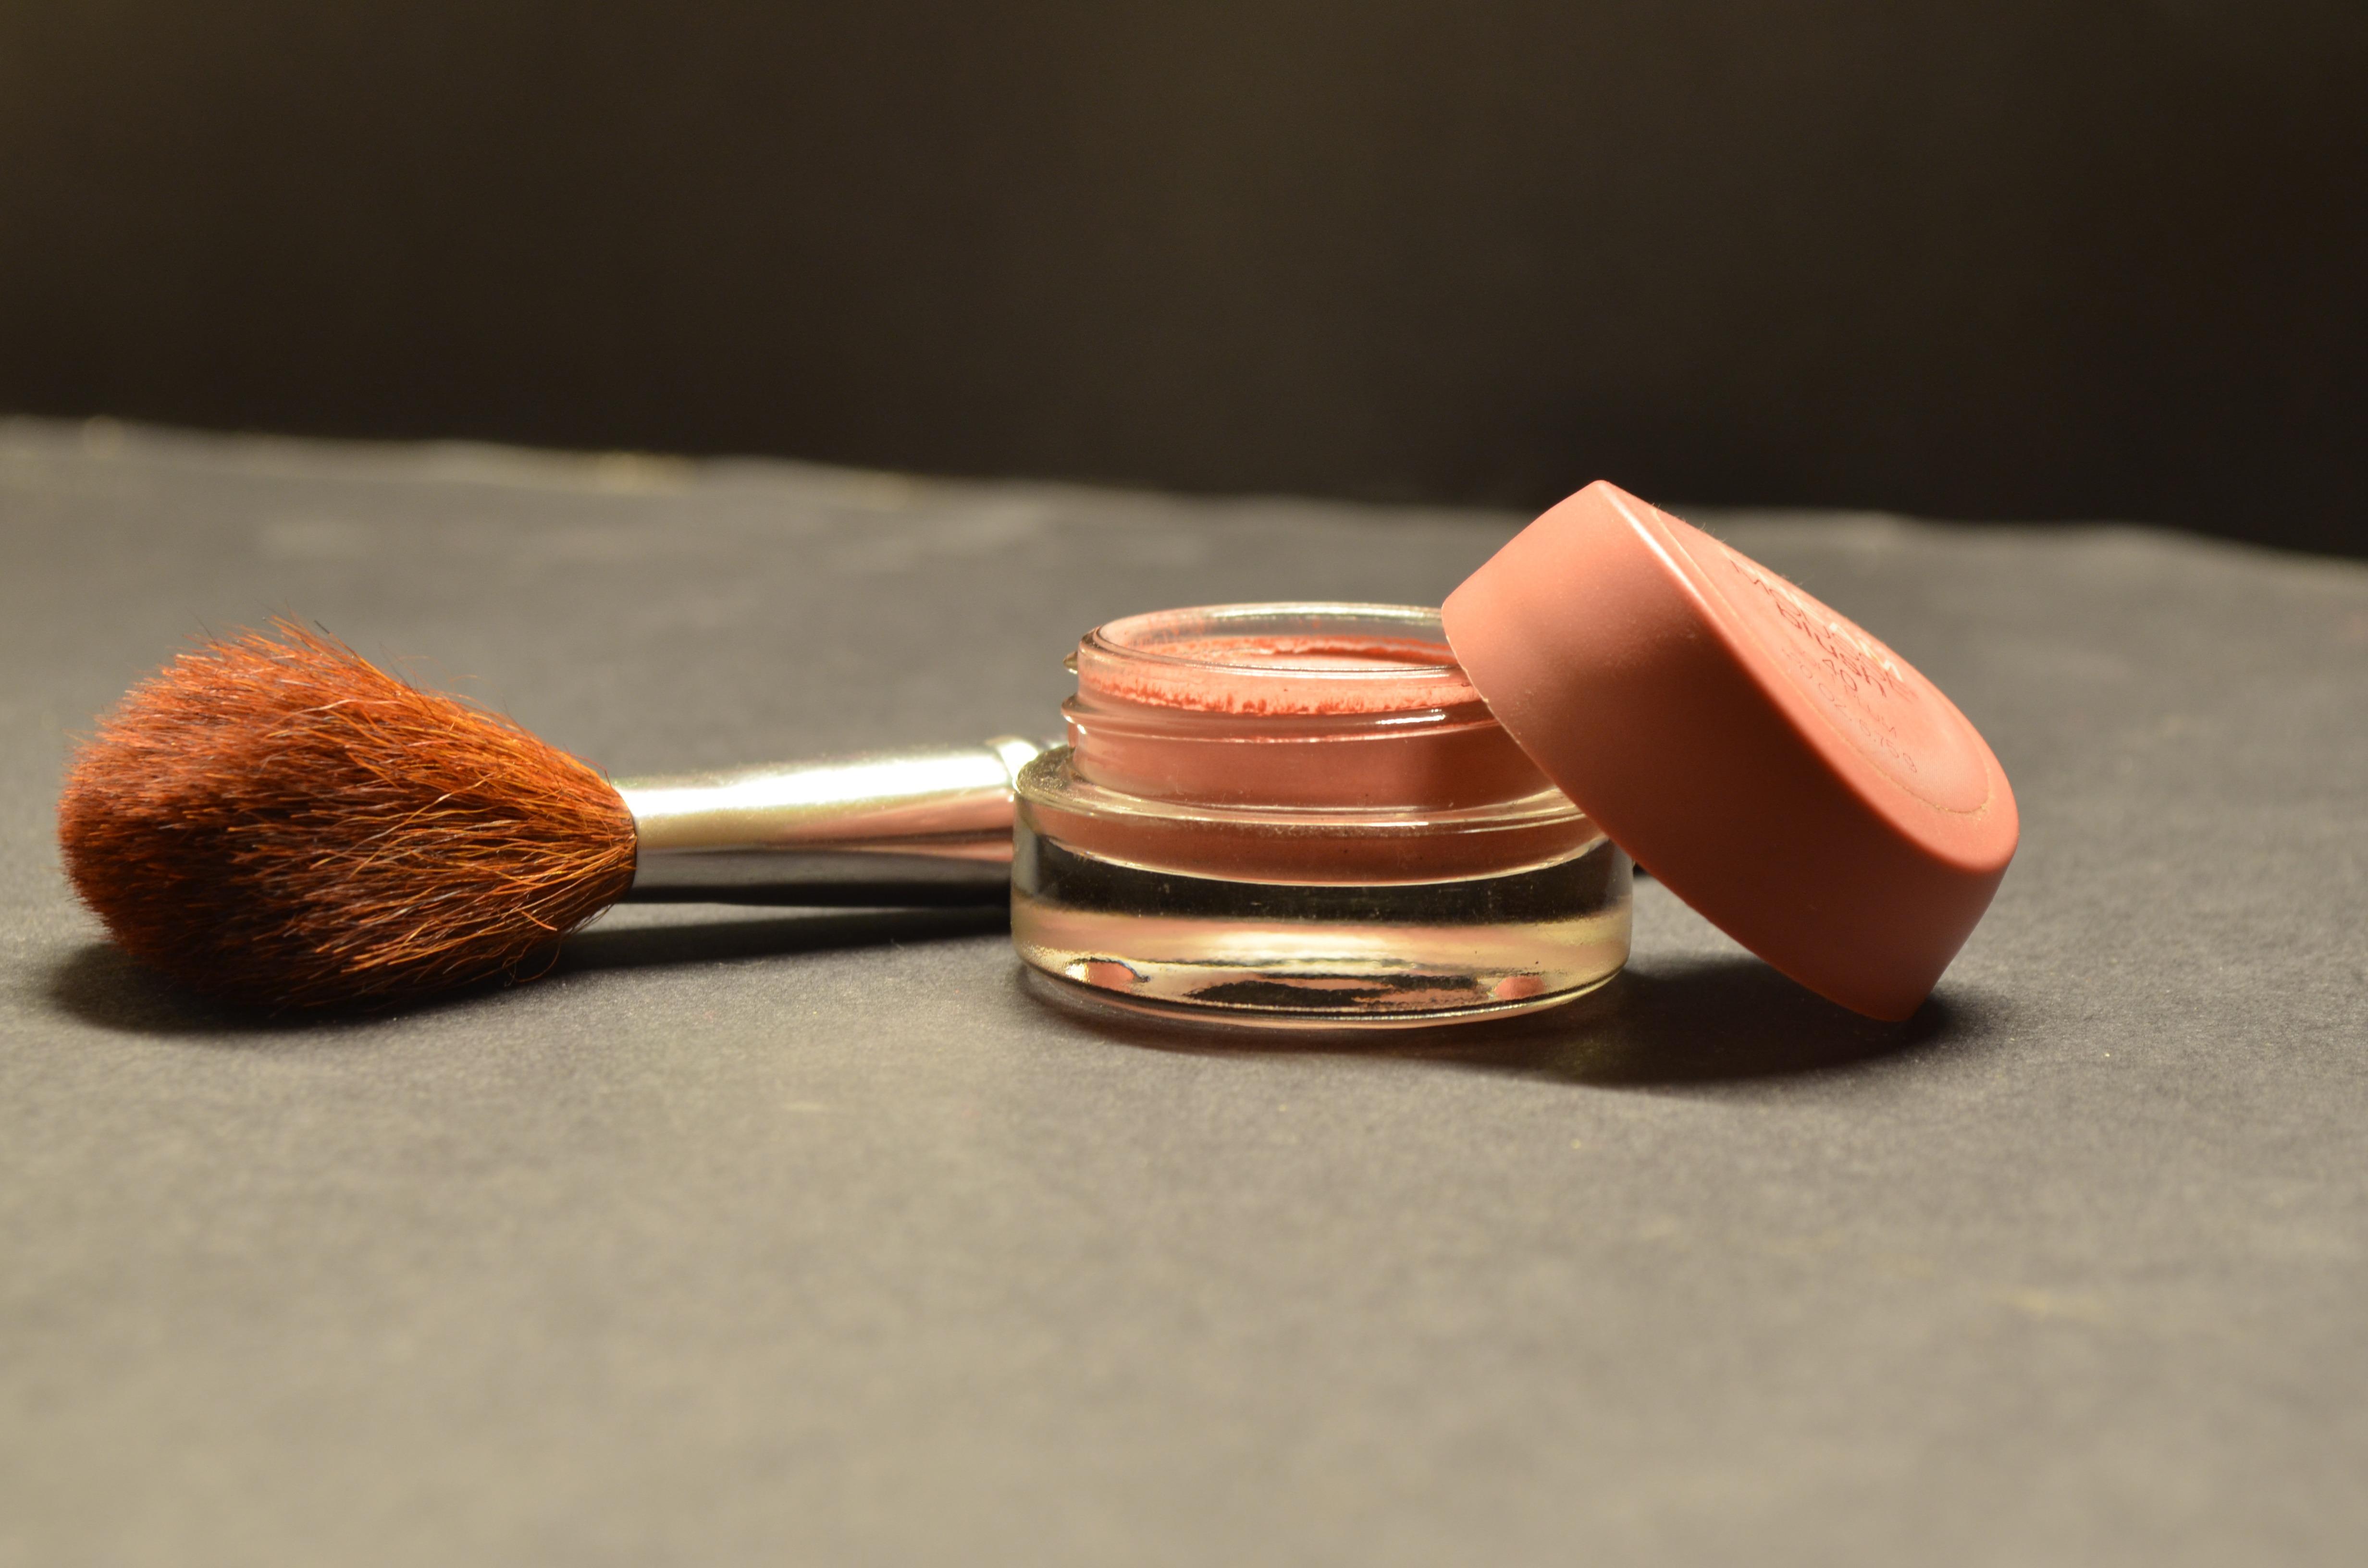 Free Images : hand, brush, finger, brown, care, powder, makeup, feminine, make up, human body ...